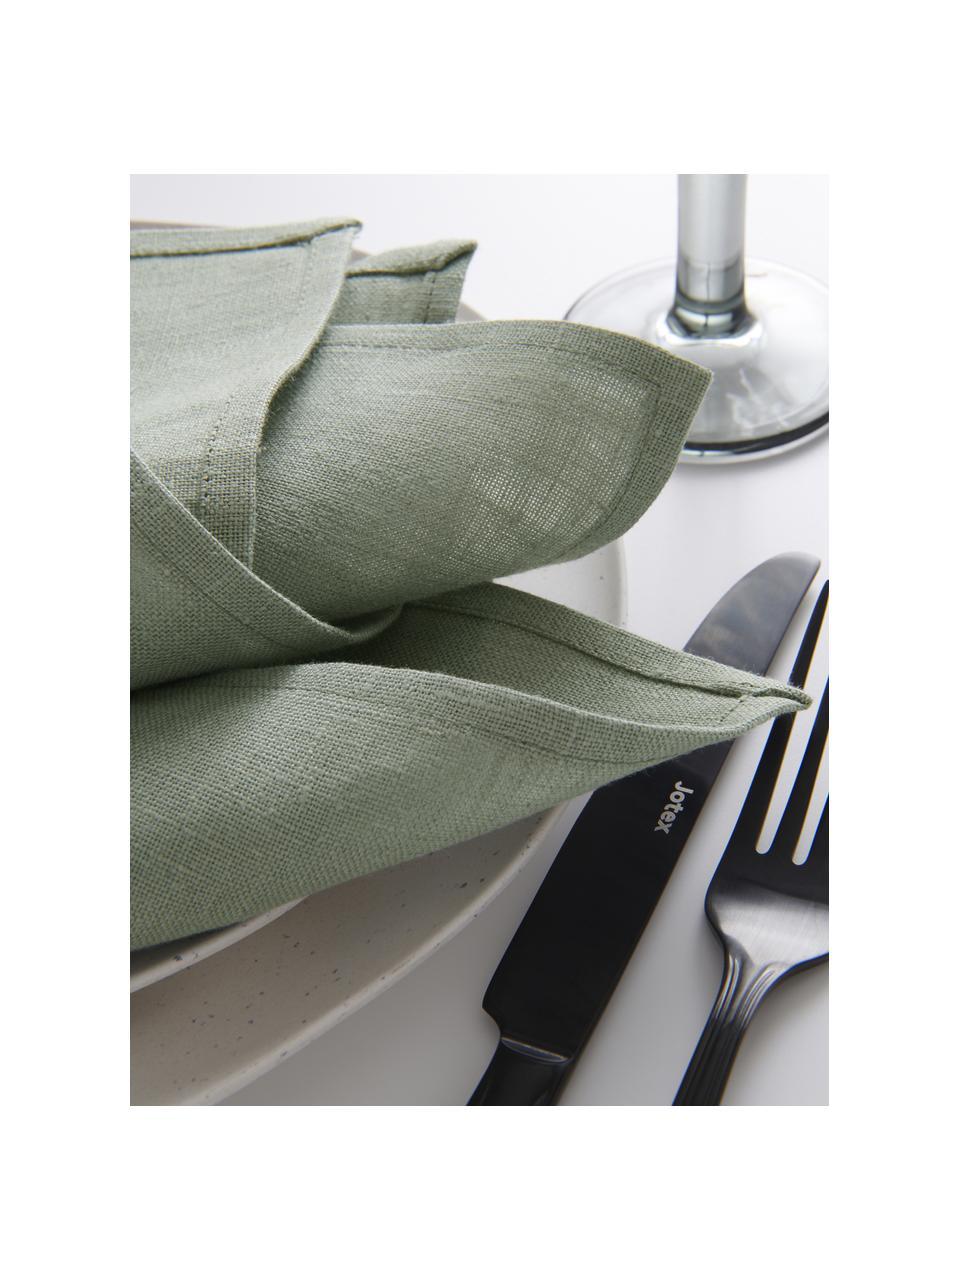 Tovagliolo in lino grigio verde Heddie 2 pz, 100% lino, Grigio-verde, Larg. 45 x Lung. 45 cm